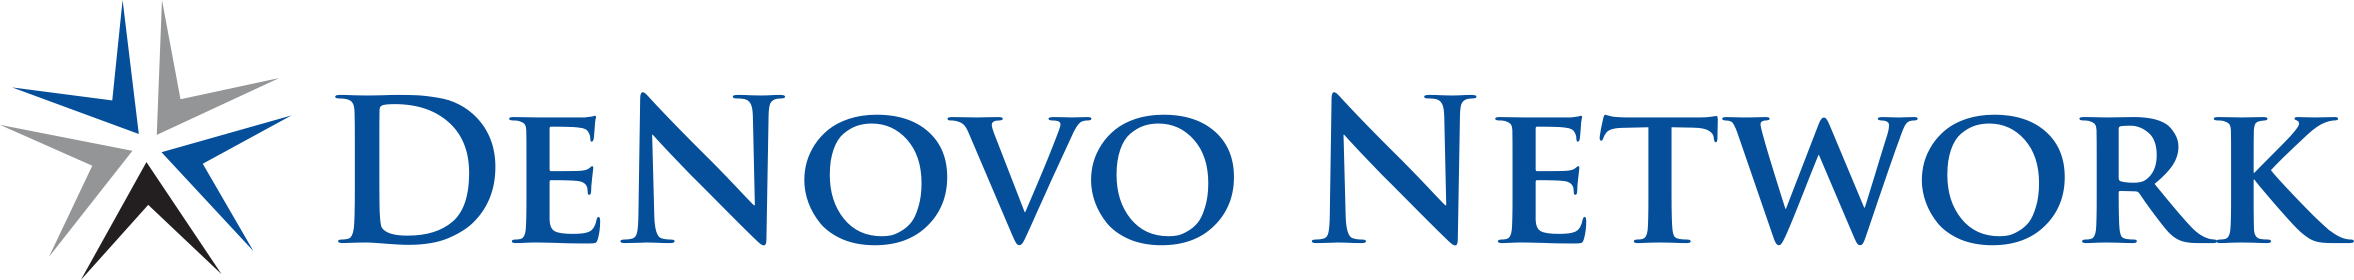 Neurontin high » Neurontin anxiety :: The DeNovo Network